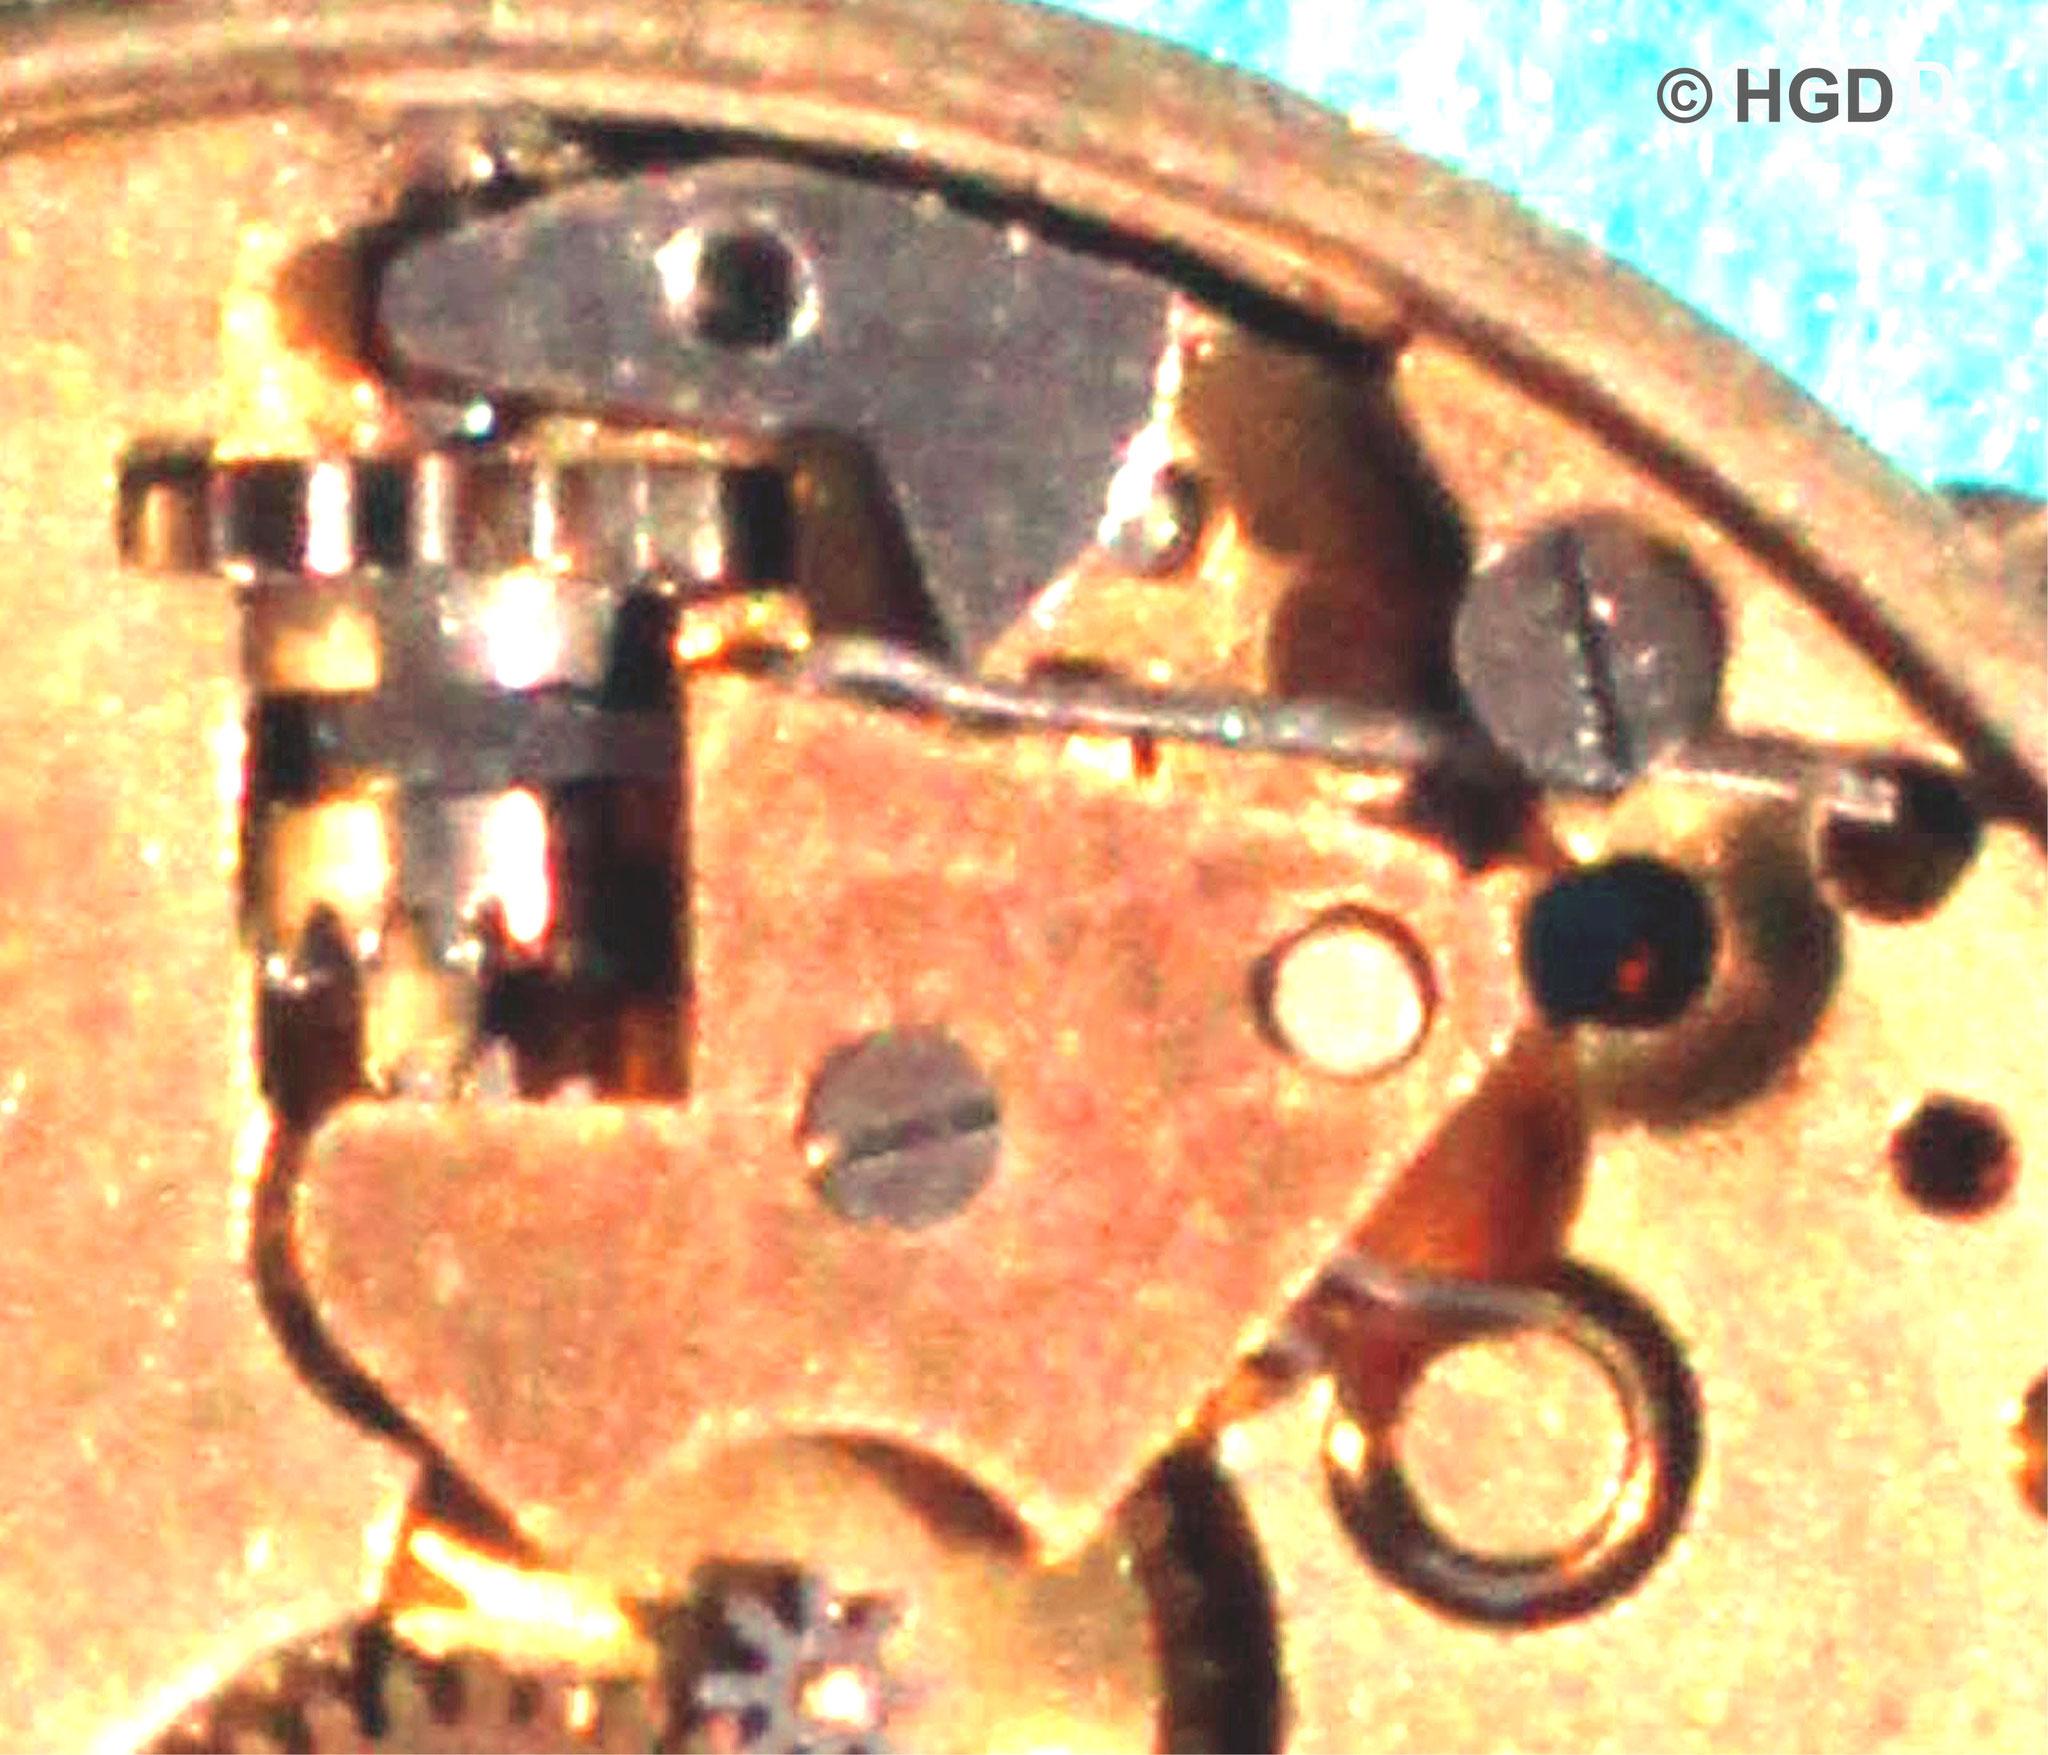 UROFA - Zeigerstellmechanismus